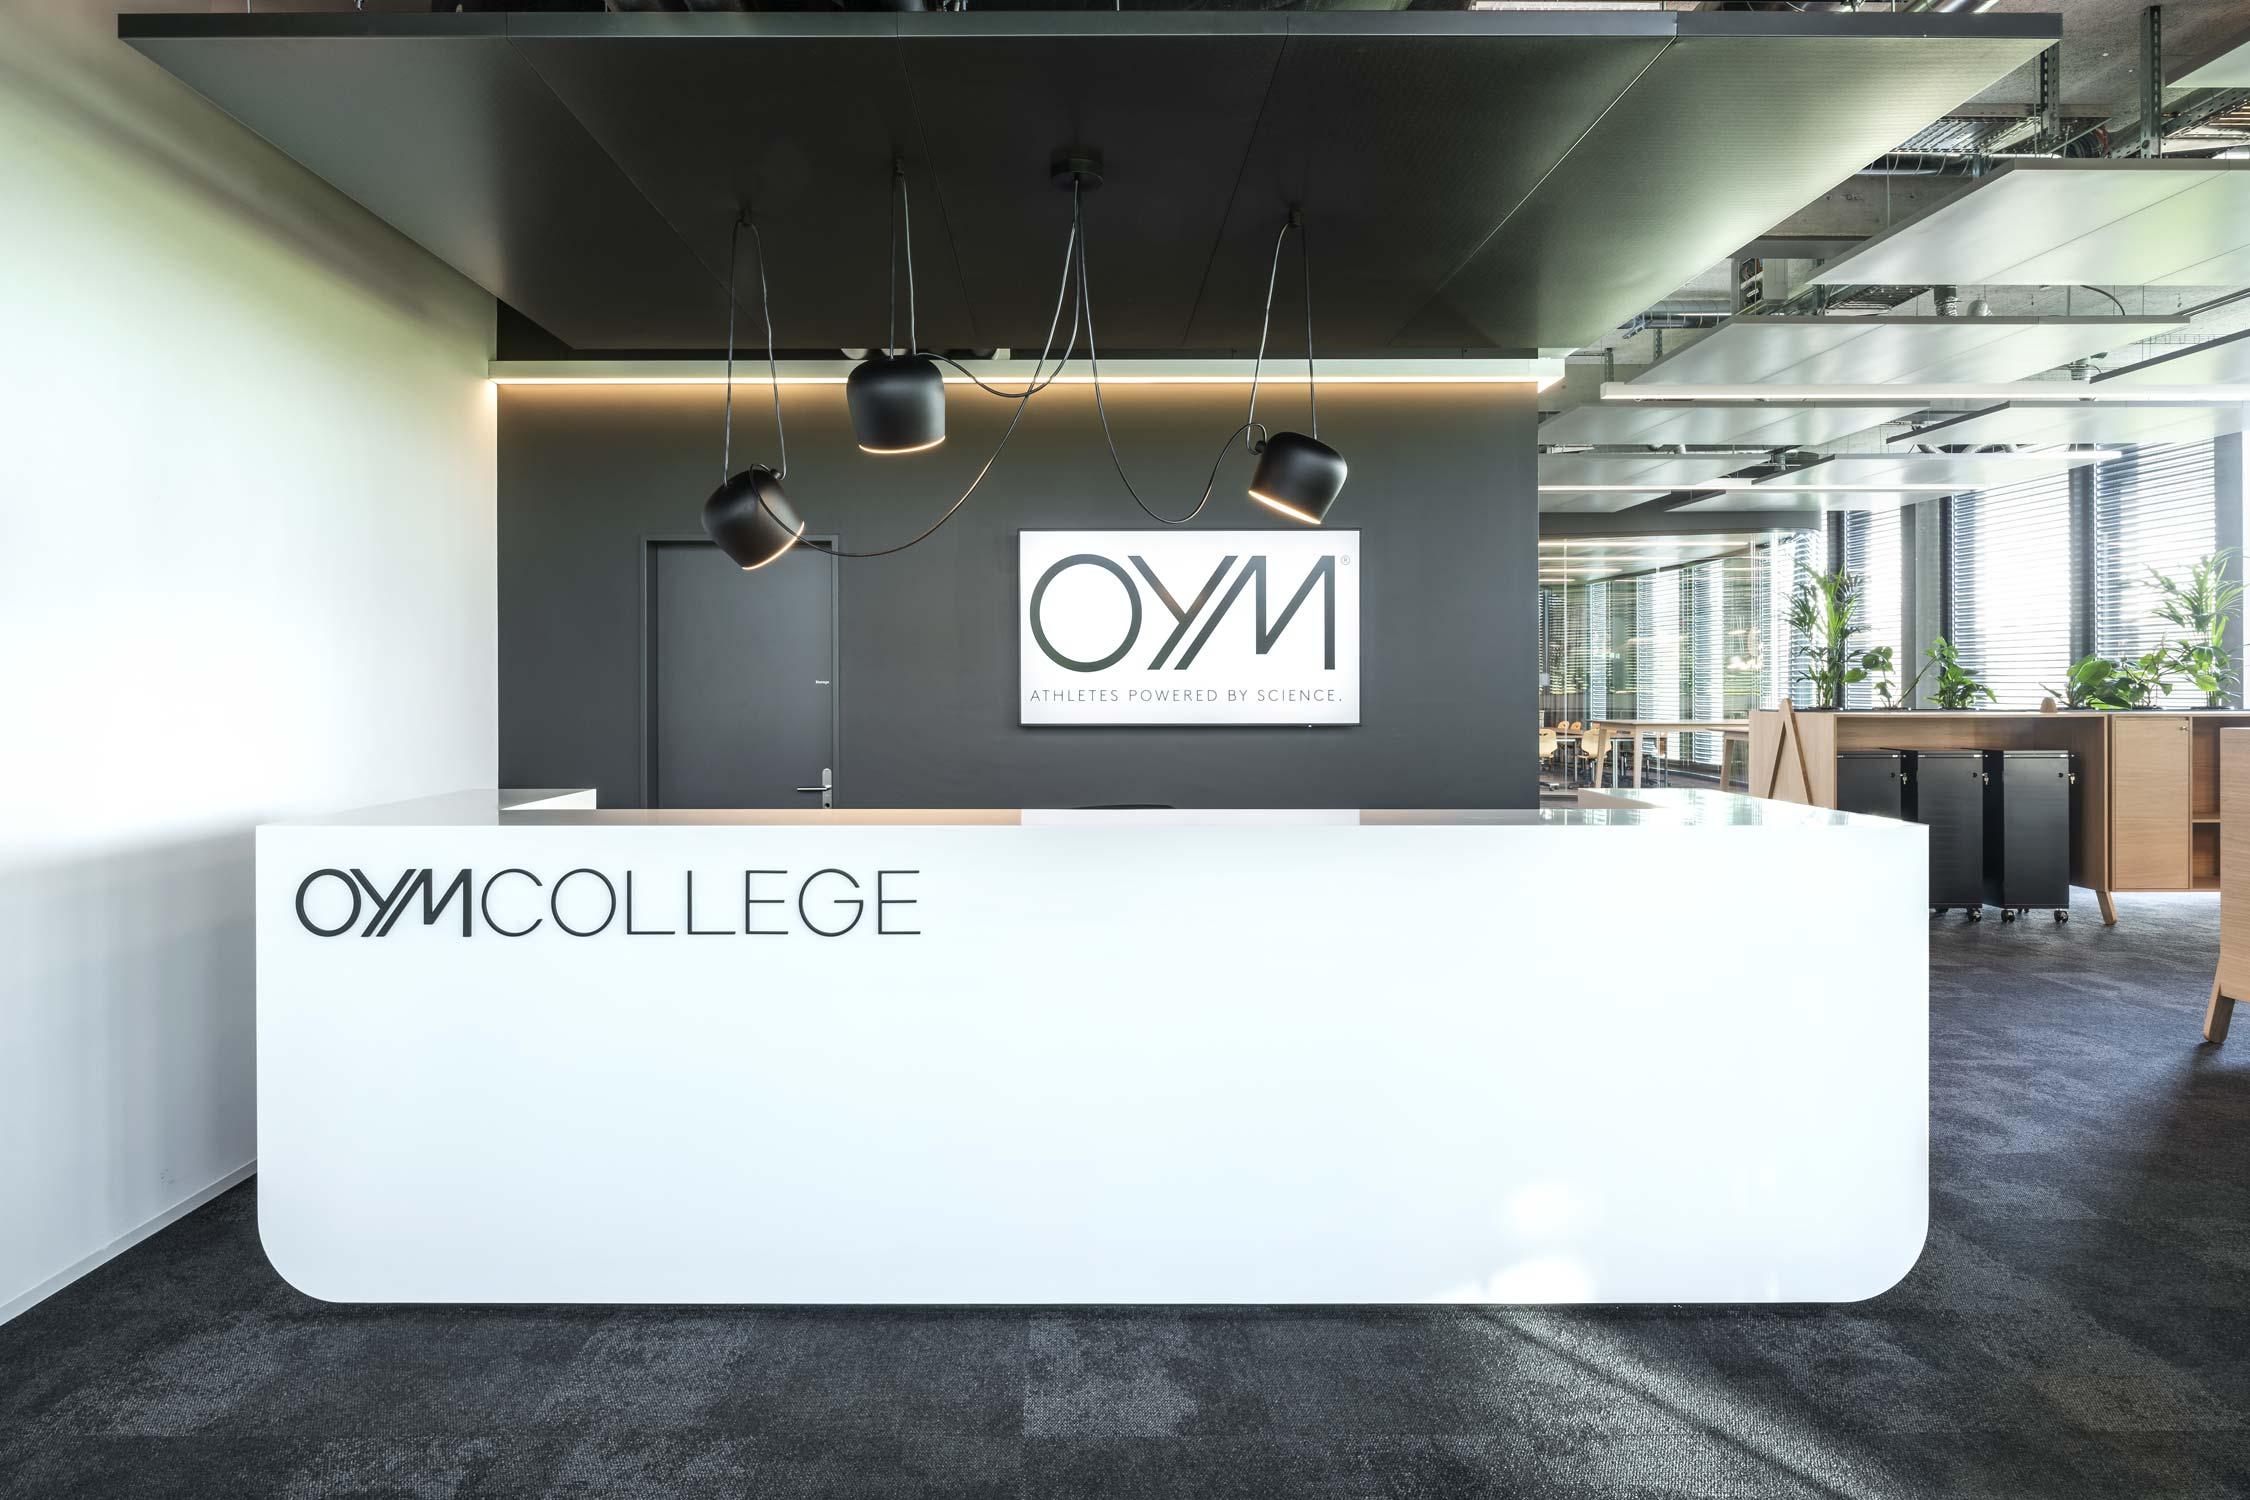 OYM Innenaufnahme Rezeption College Architekturfotografie Regine Giesecke